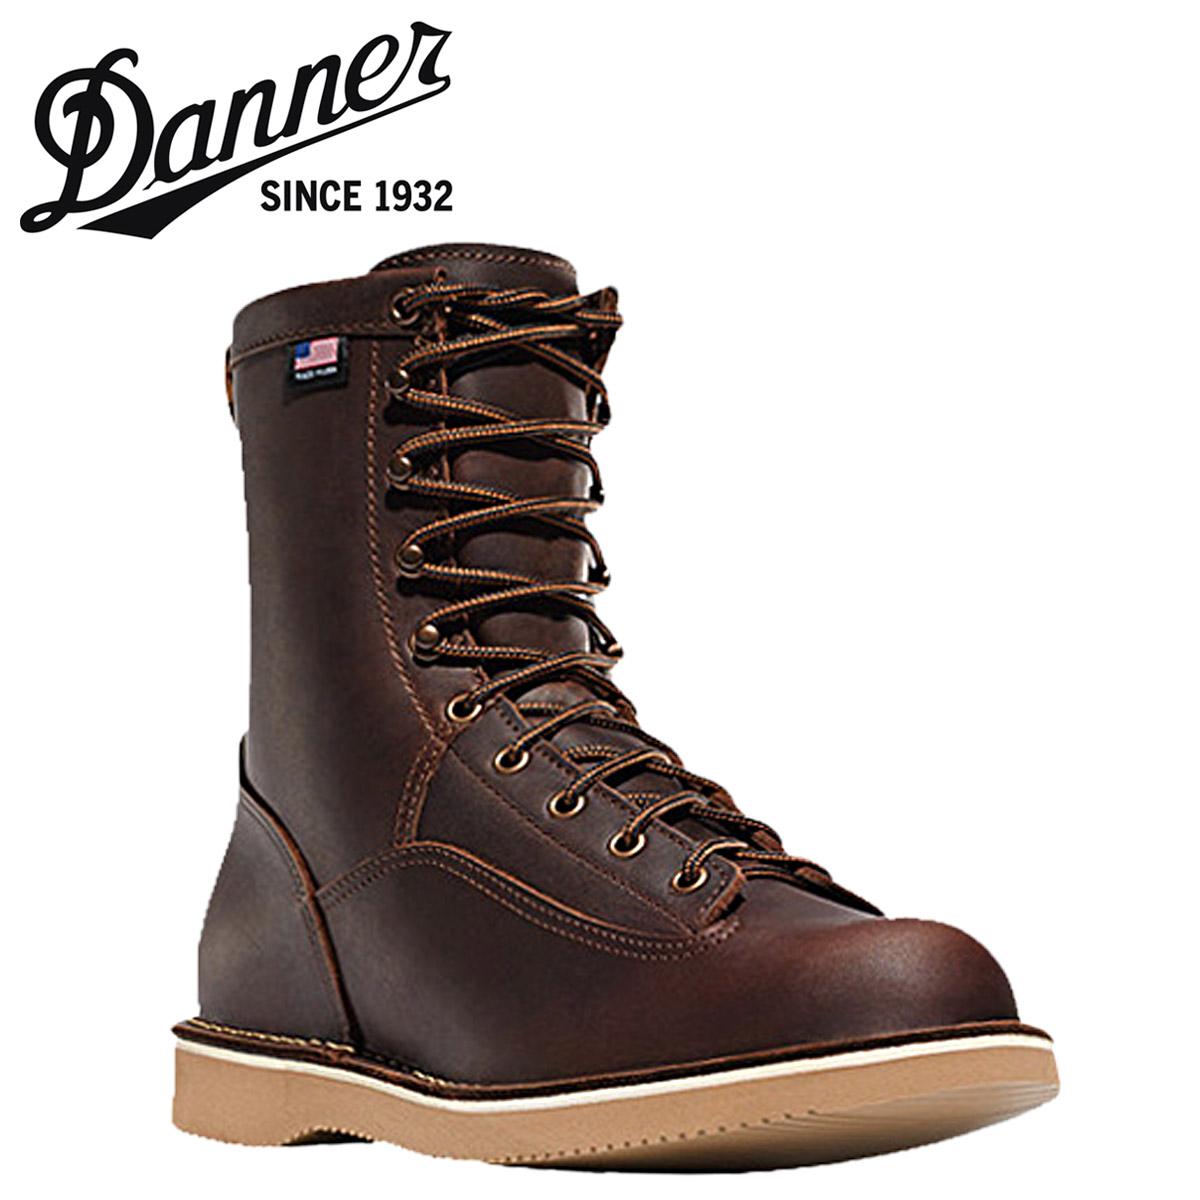 DANNER Danner ダナーライト ブーツ ダナー LIGHT HEATHMAN 30532 EEワイズ メンズ